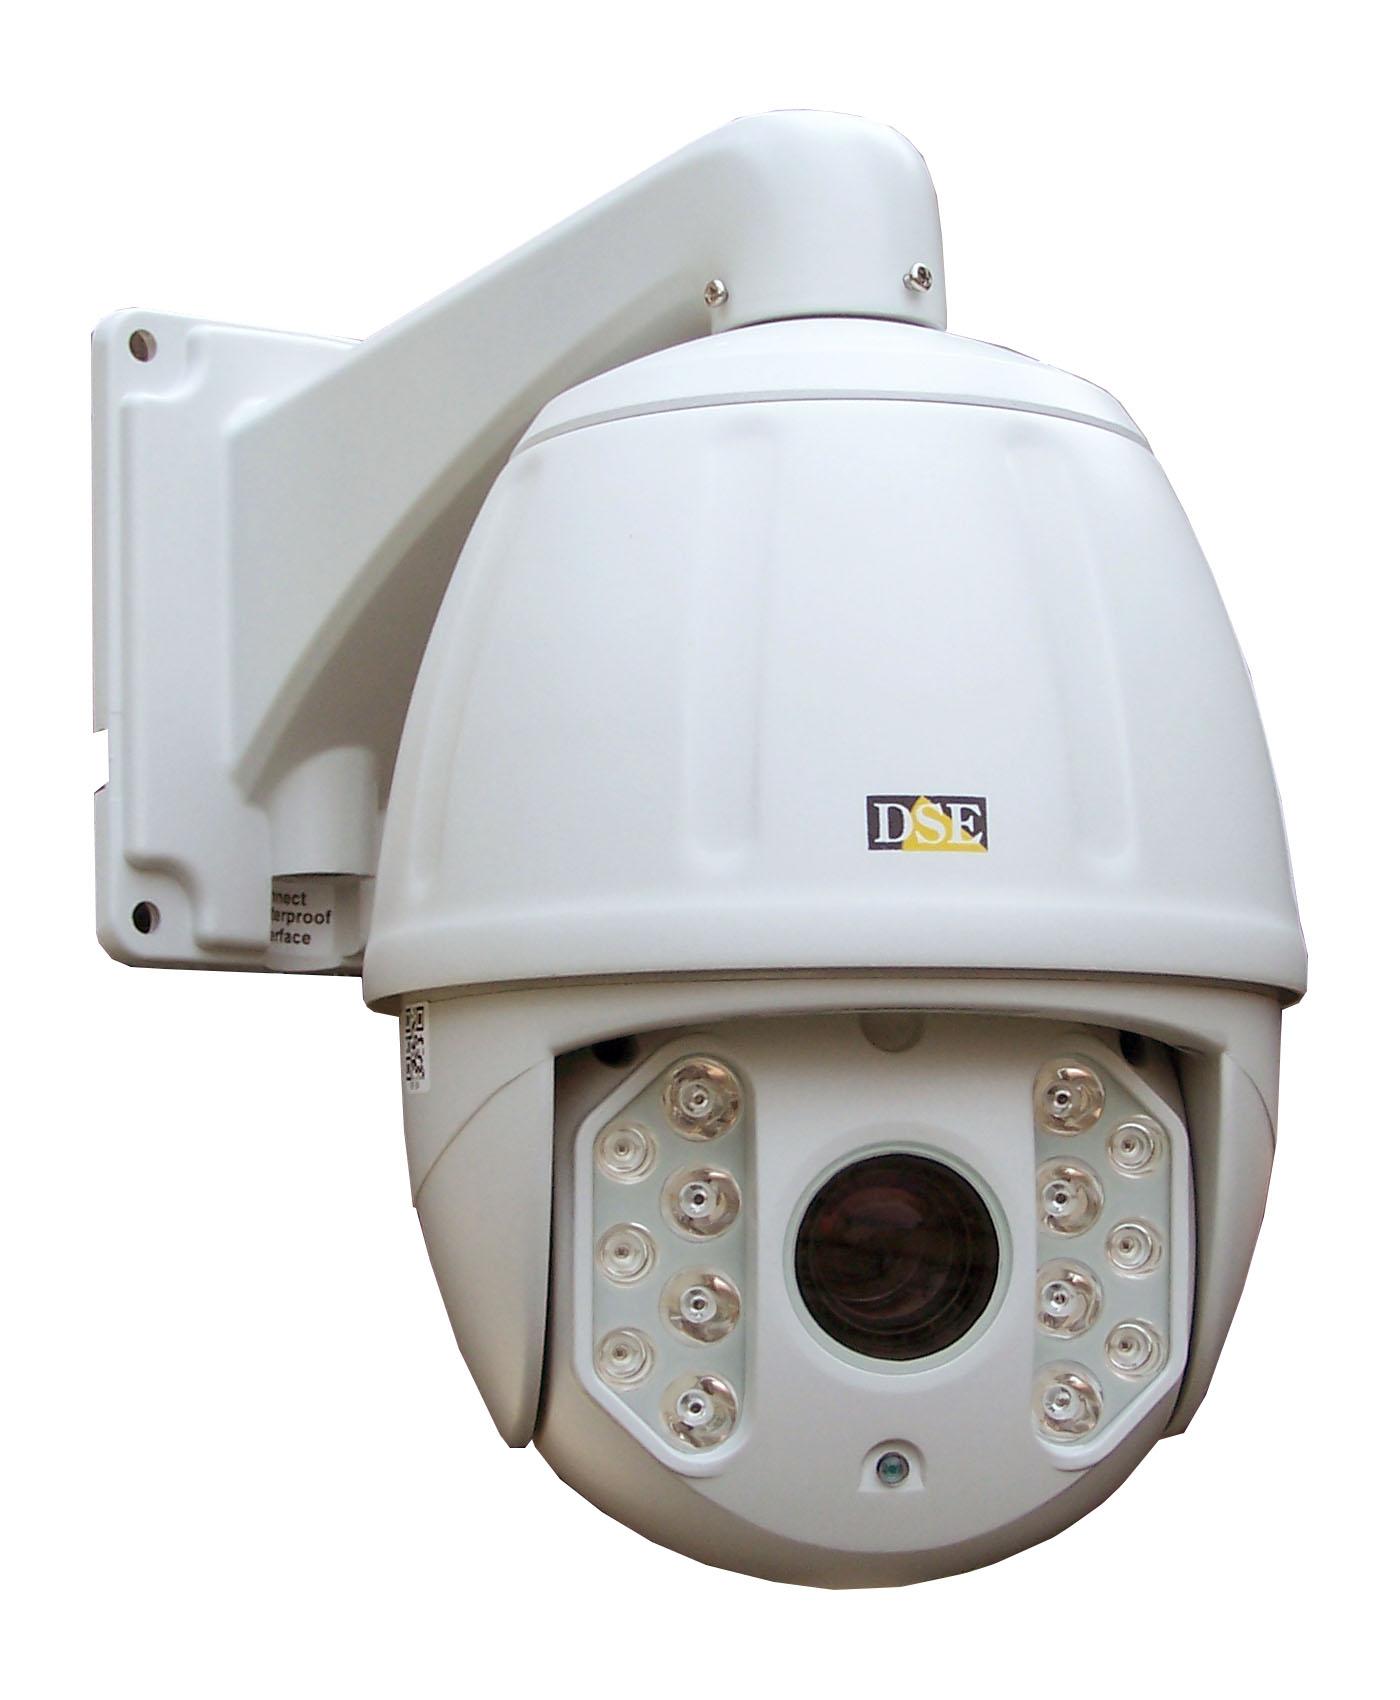 Telecamere speed dome IP ONVIF brandeggiabili, Telecamere IP motorizzate, Telecamere PTZ ...